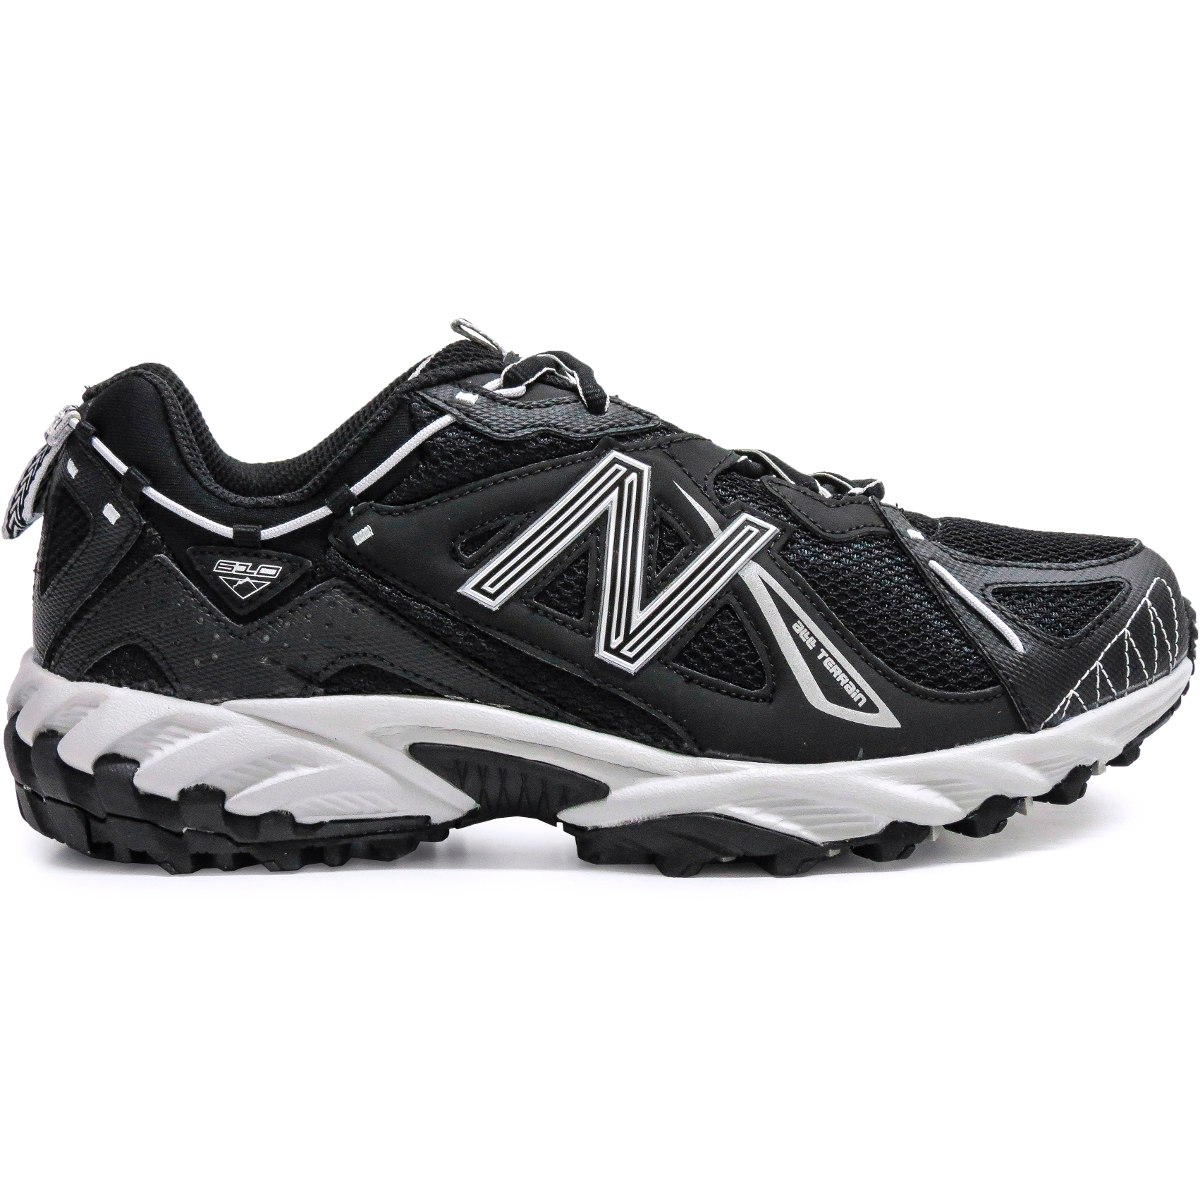 Trail Mt610 Hombre 1 Running 685 New Balance Zapatillas Dzo0qd Trekking q0XwEt